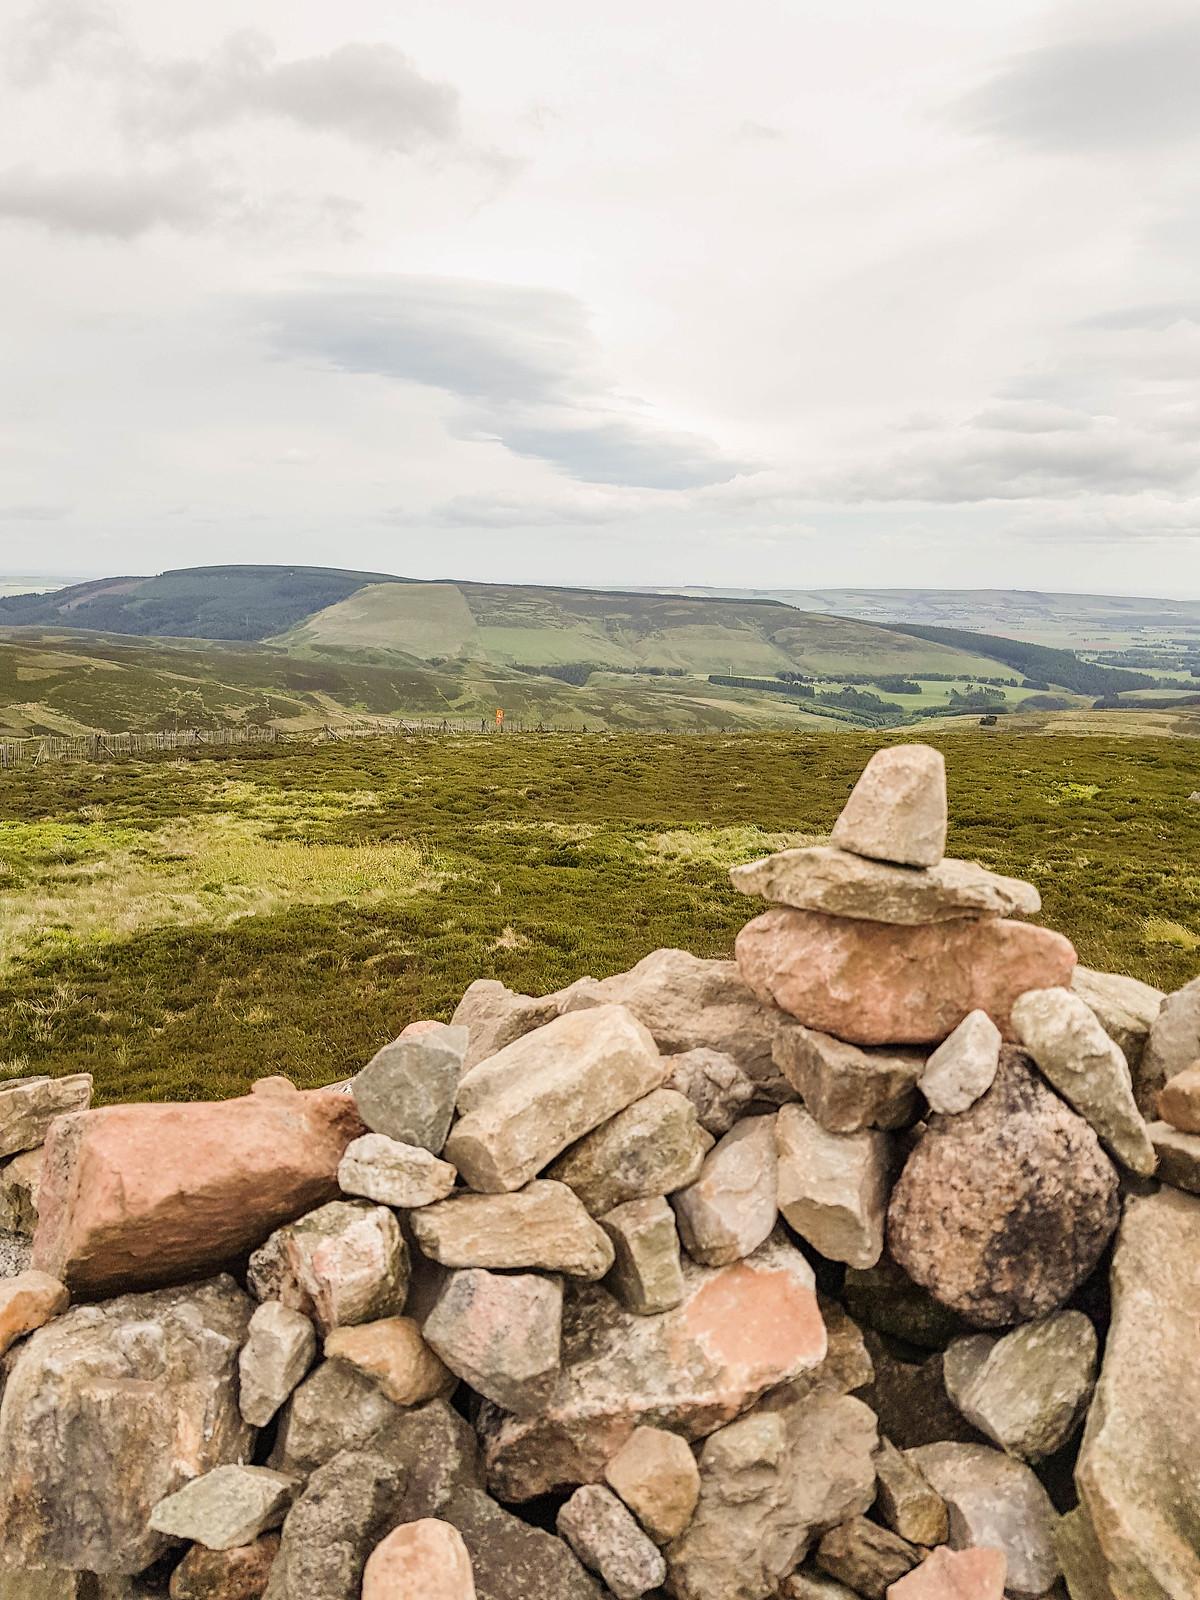 20180614 - Cairn O' Mount